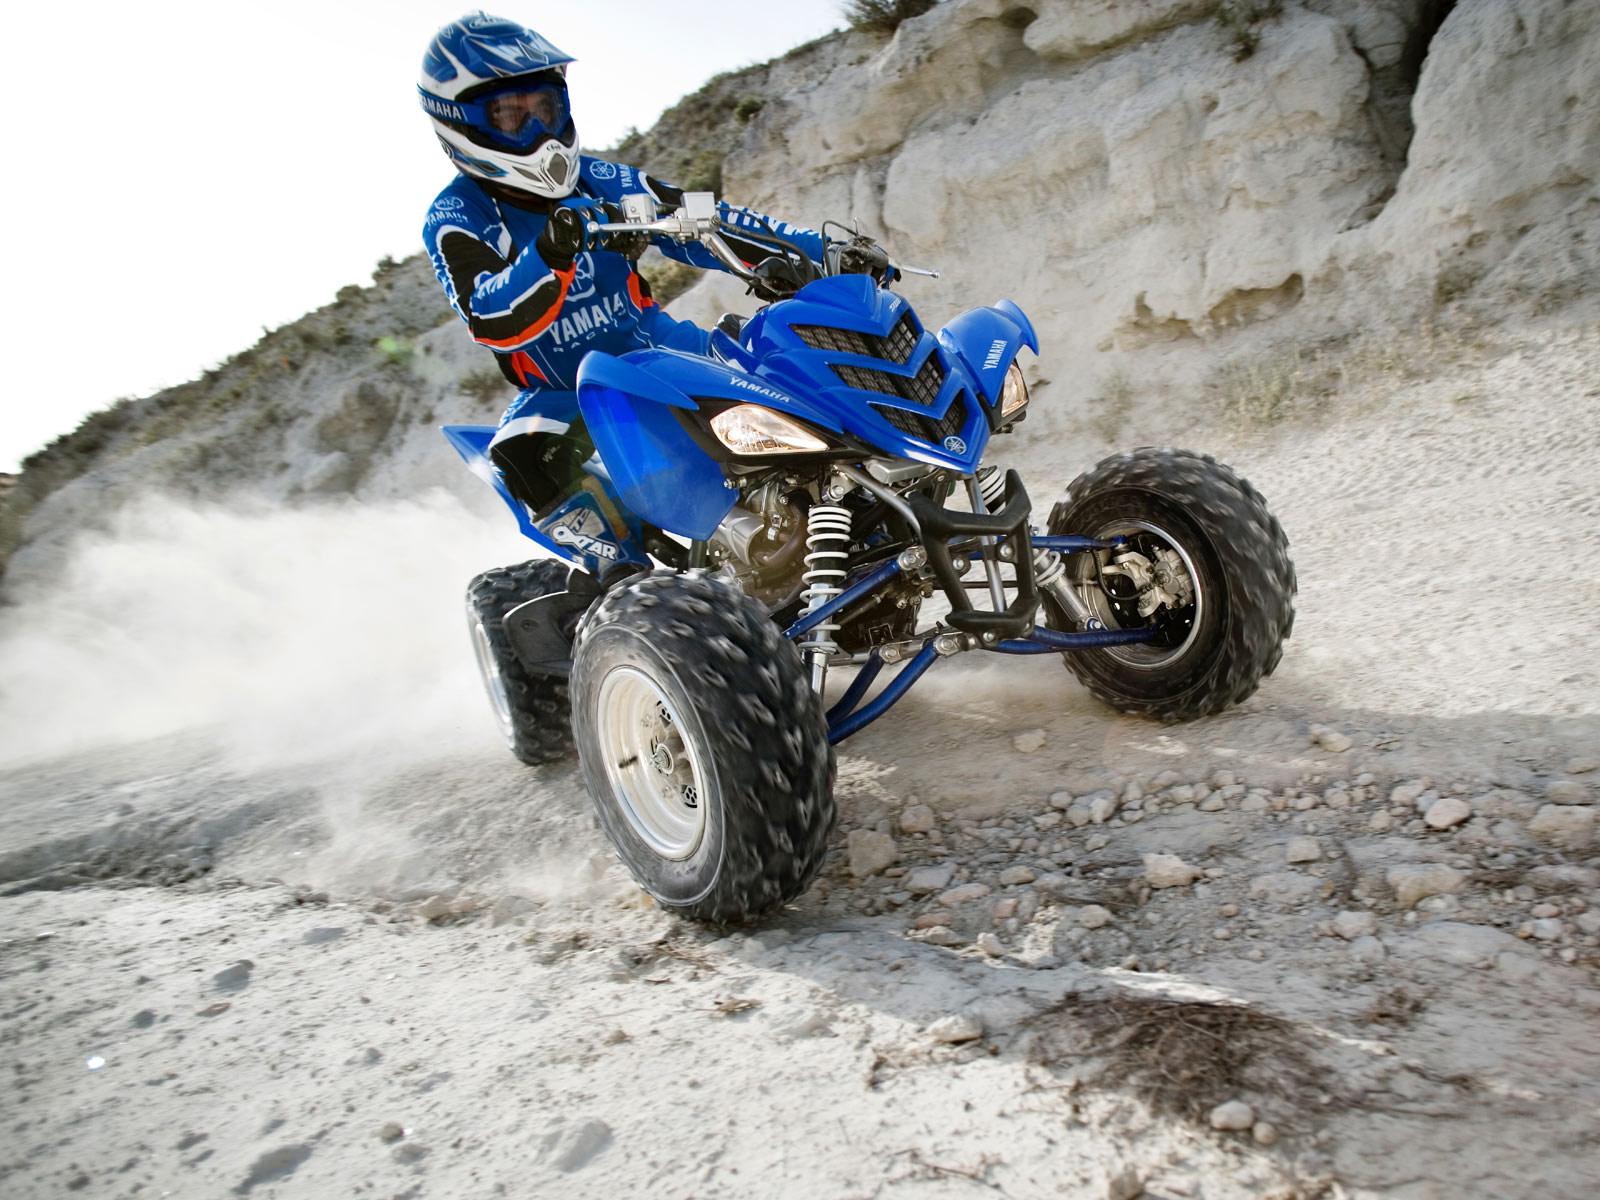 YAMAHA RAPTOR atv quad offroad motorbike bike dirtbike d wallpaper 1600x1200